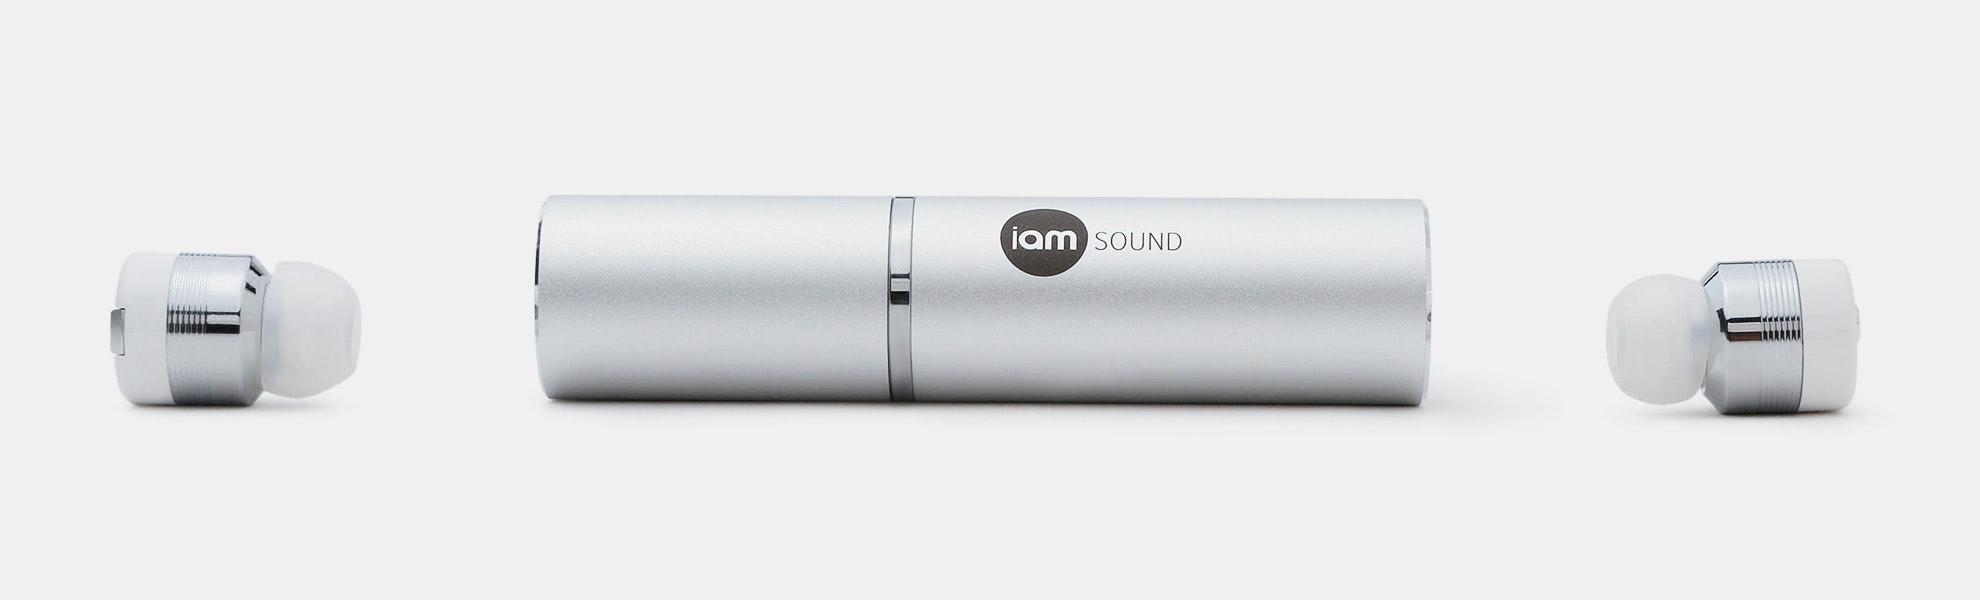 iAm Sound Smallest True Wireless Stereo Earbuds